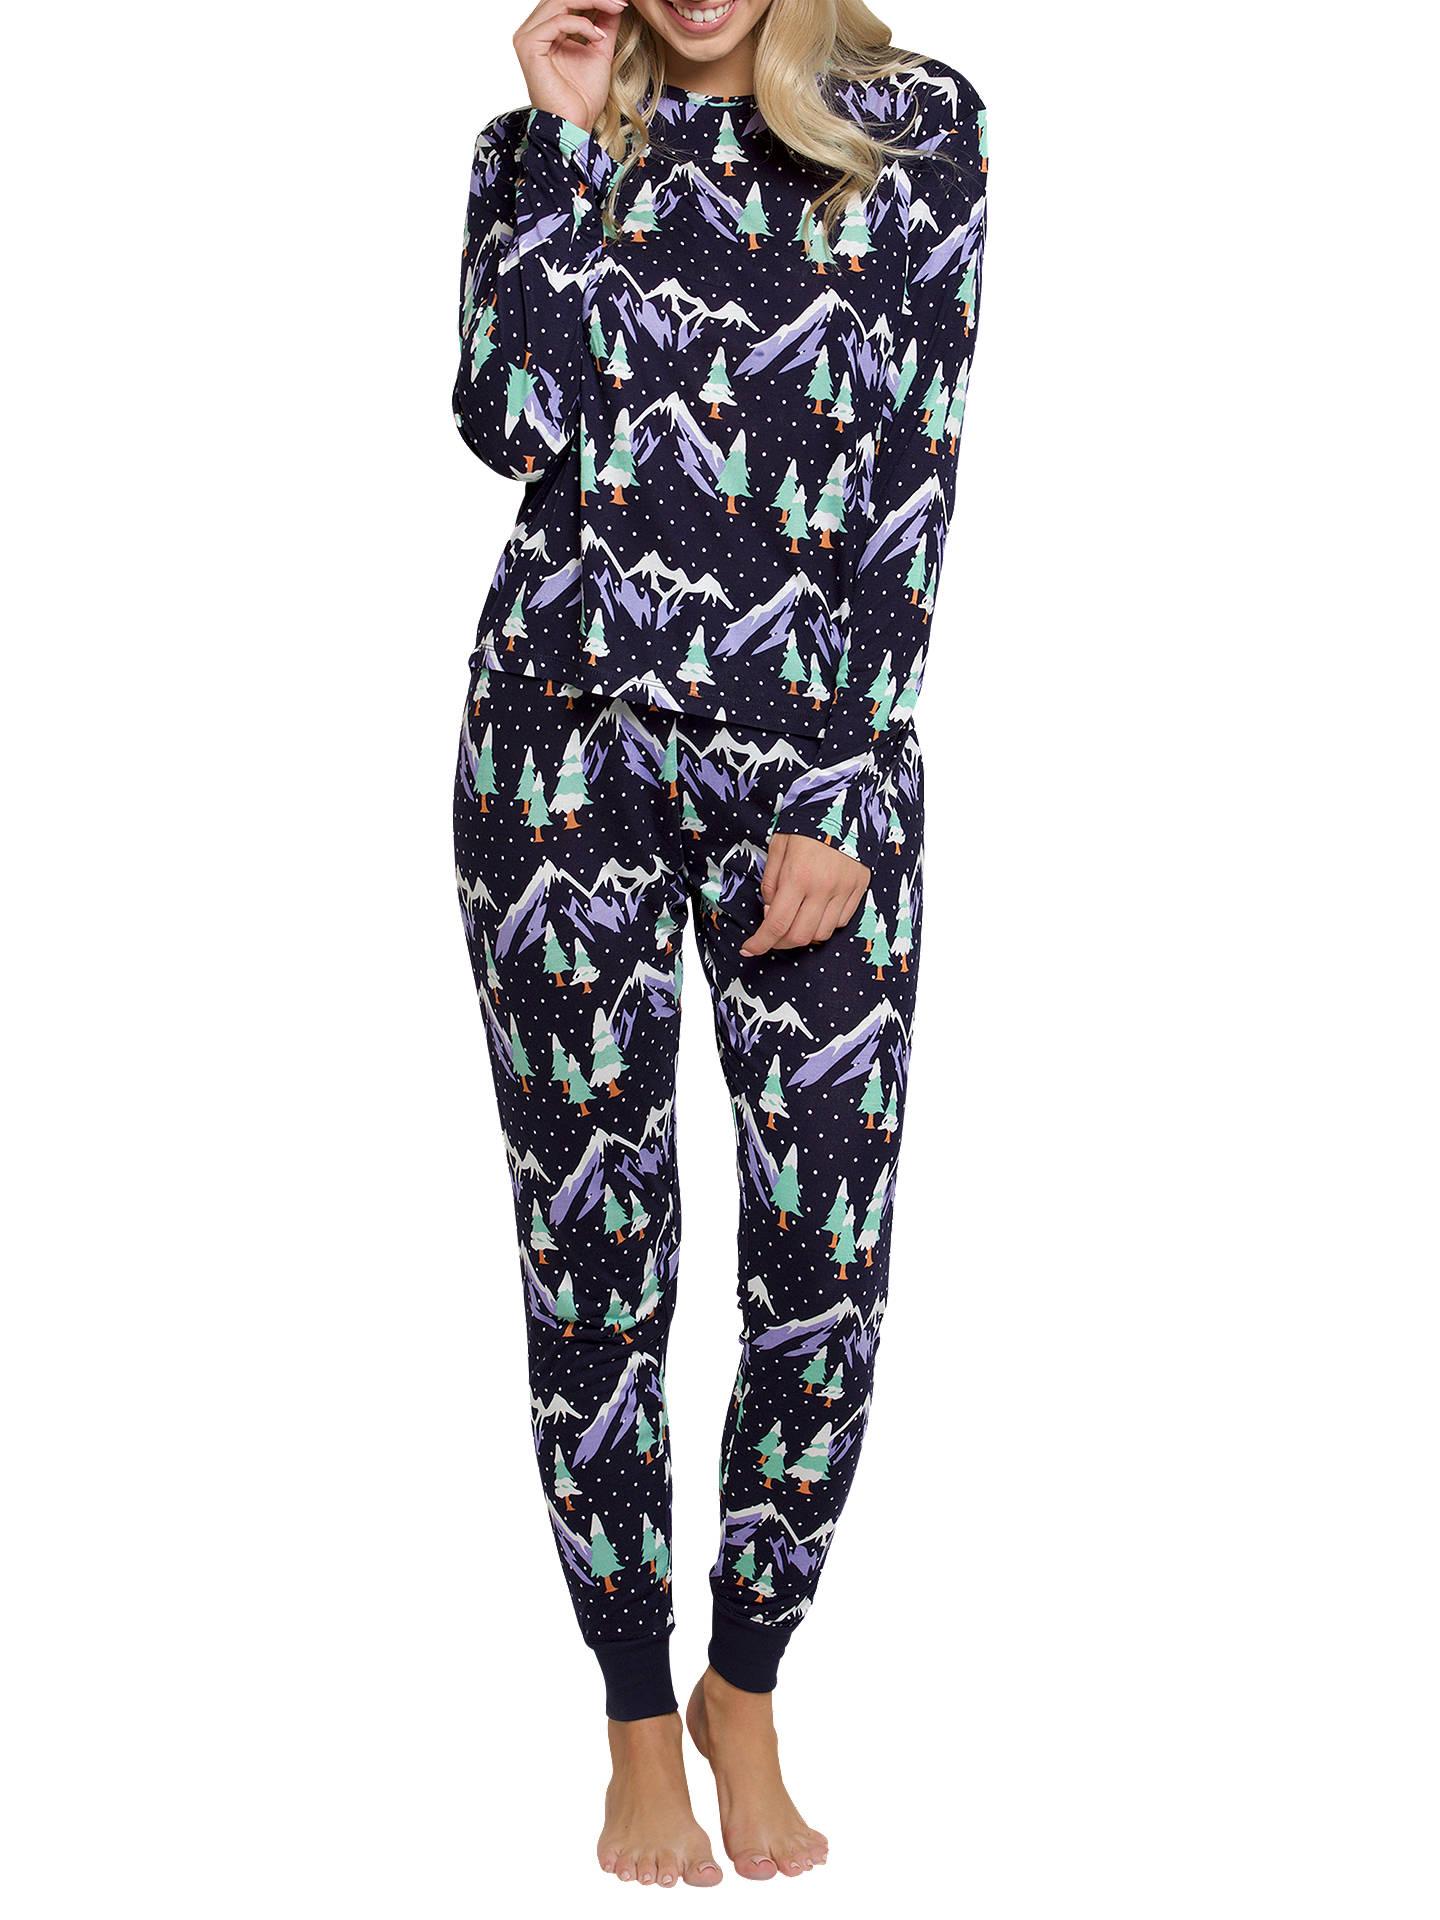 cheapest sale comfortable feel hot-selling fashion Chelsea Peers Snowy Mountain Print Pyjama Set, Navy at John ...